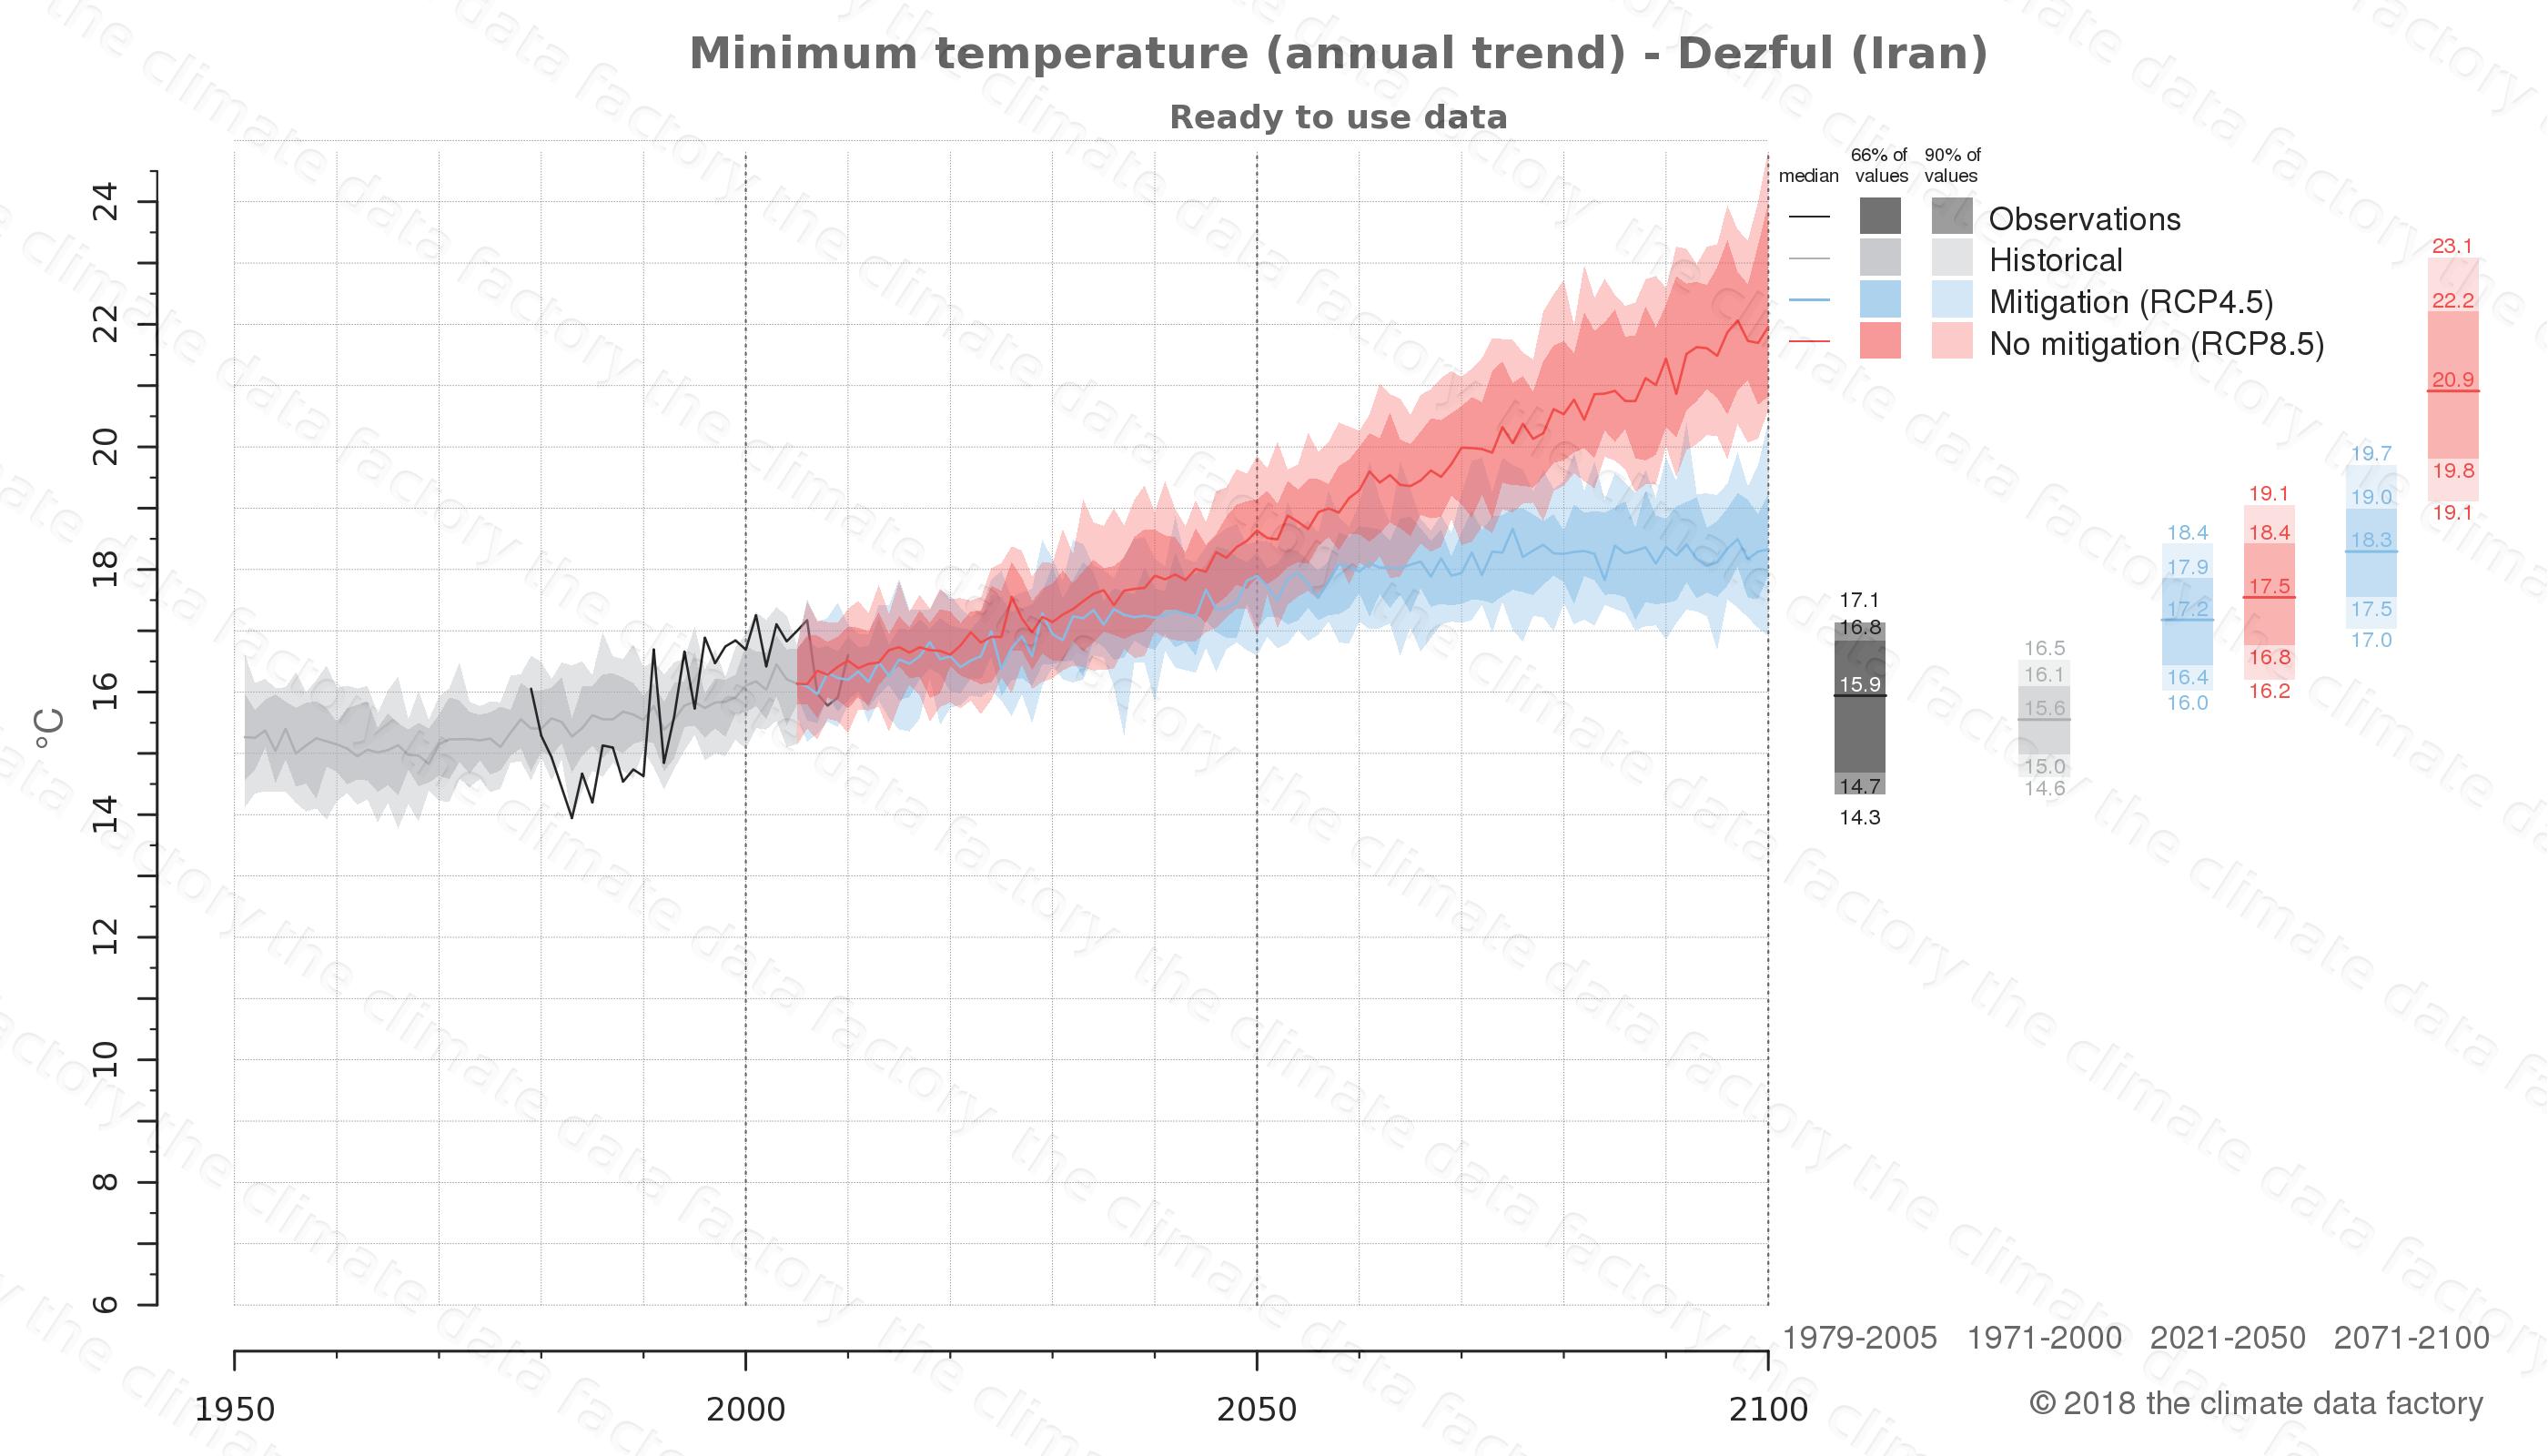 climate change data policy adaptation climate graph city data minimum-temperature dezful iran